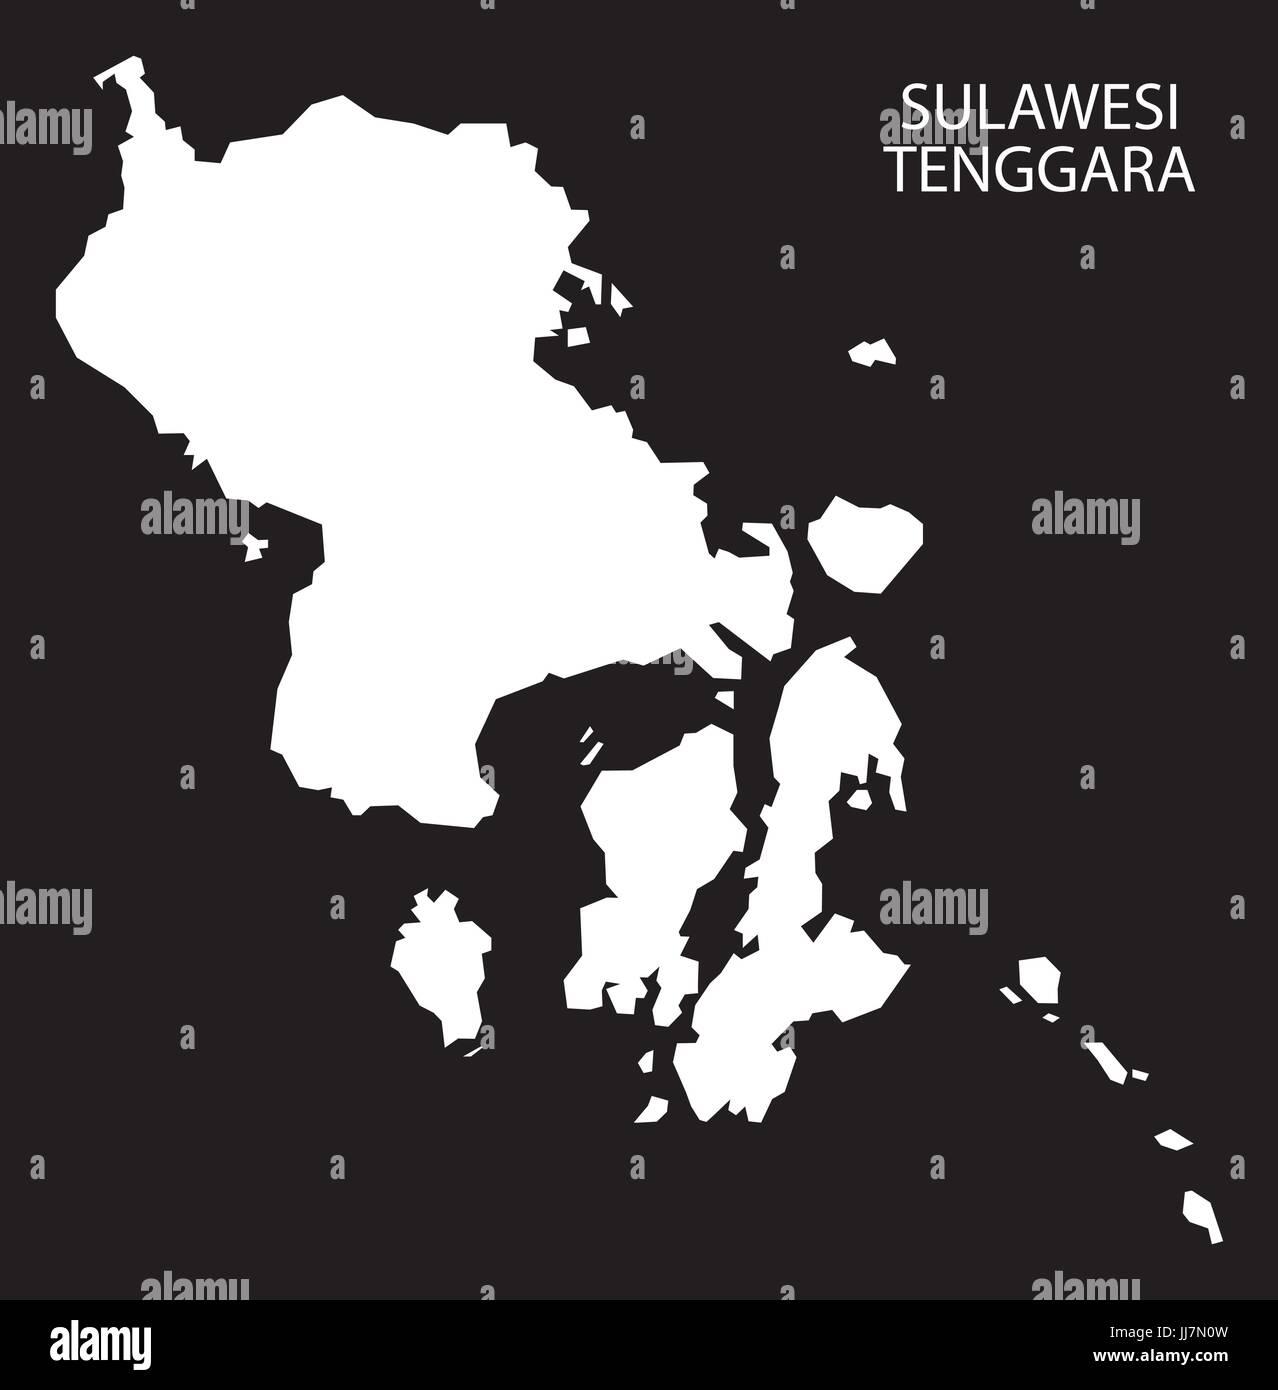 Sulawesi Tenggara Indonesia map black inverted silhouette illustration shape - Stock Vector